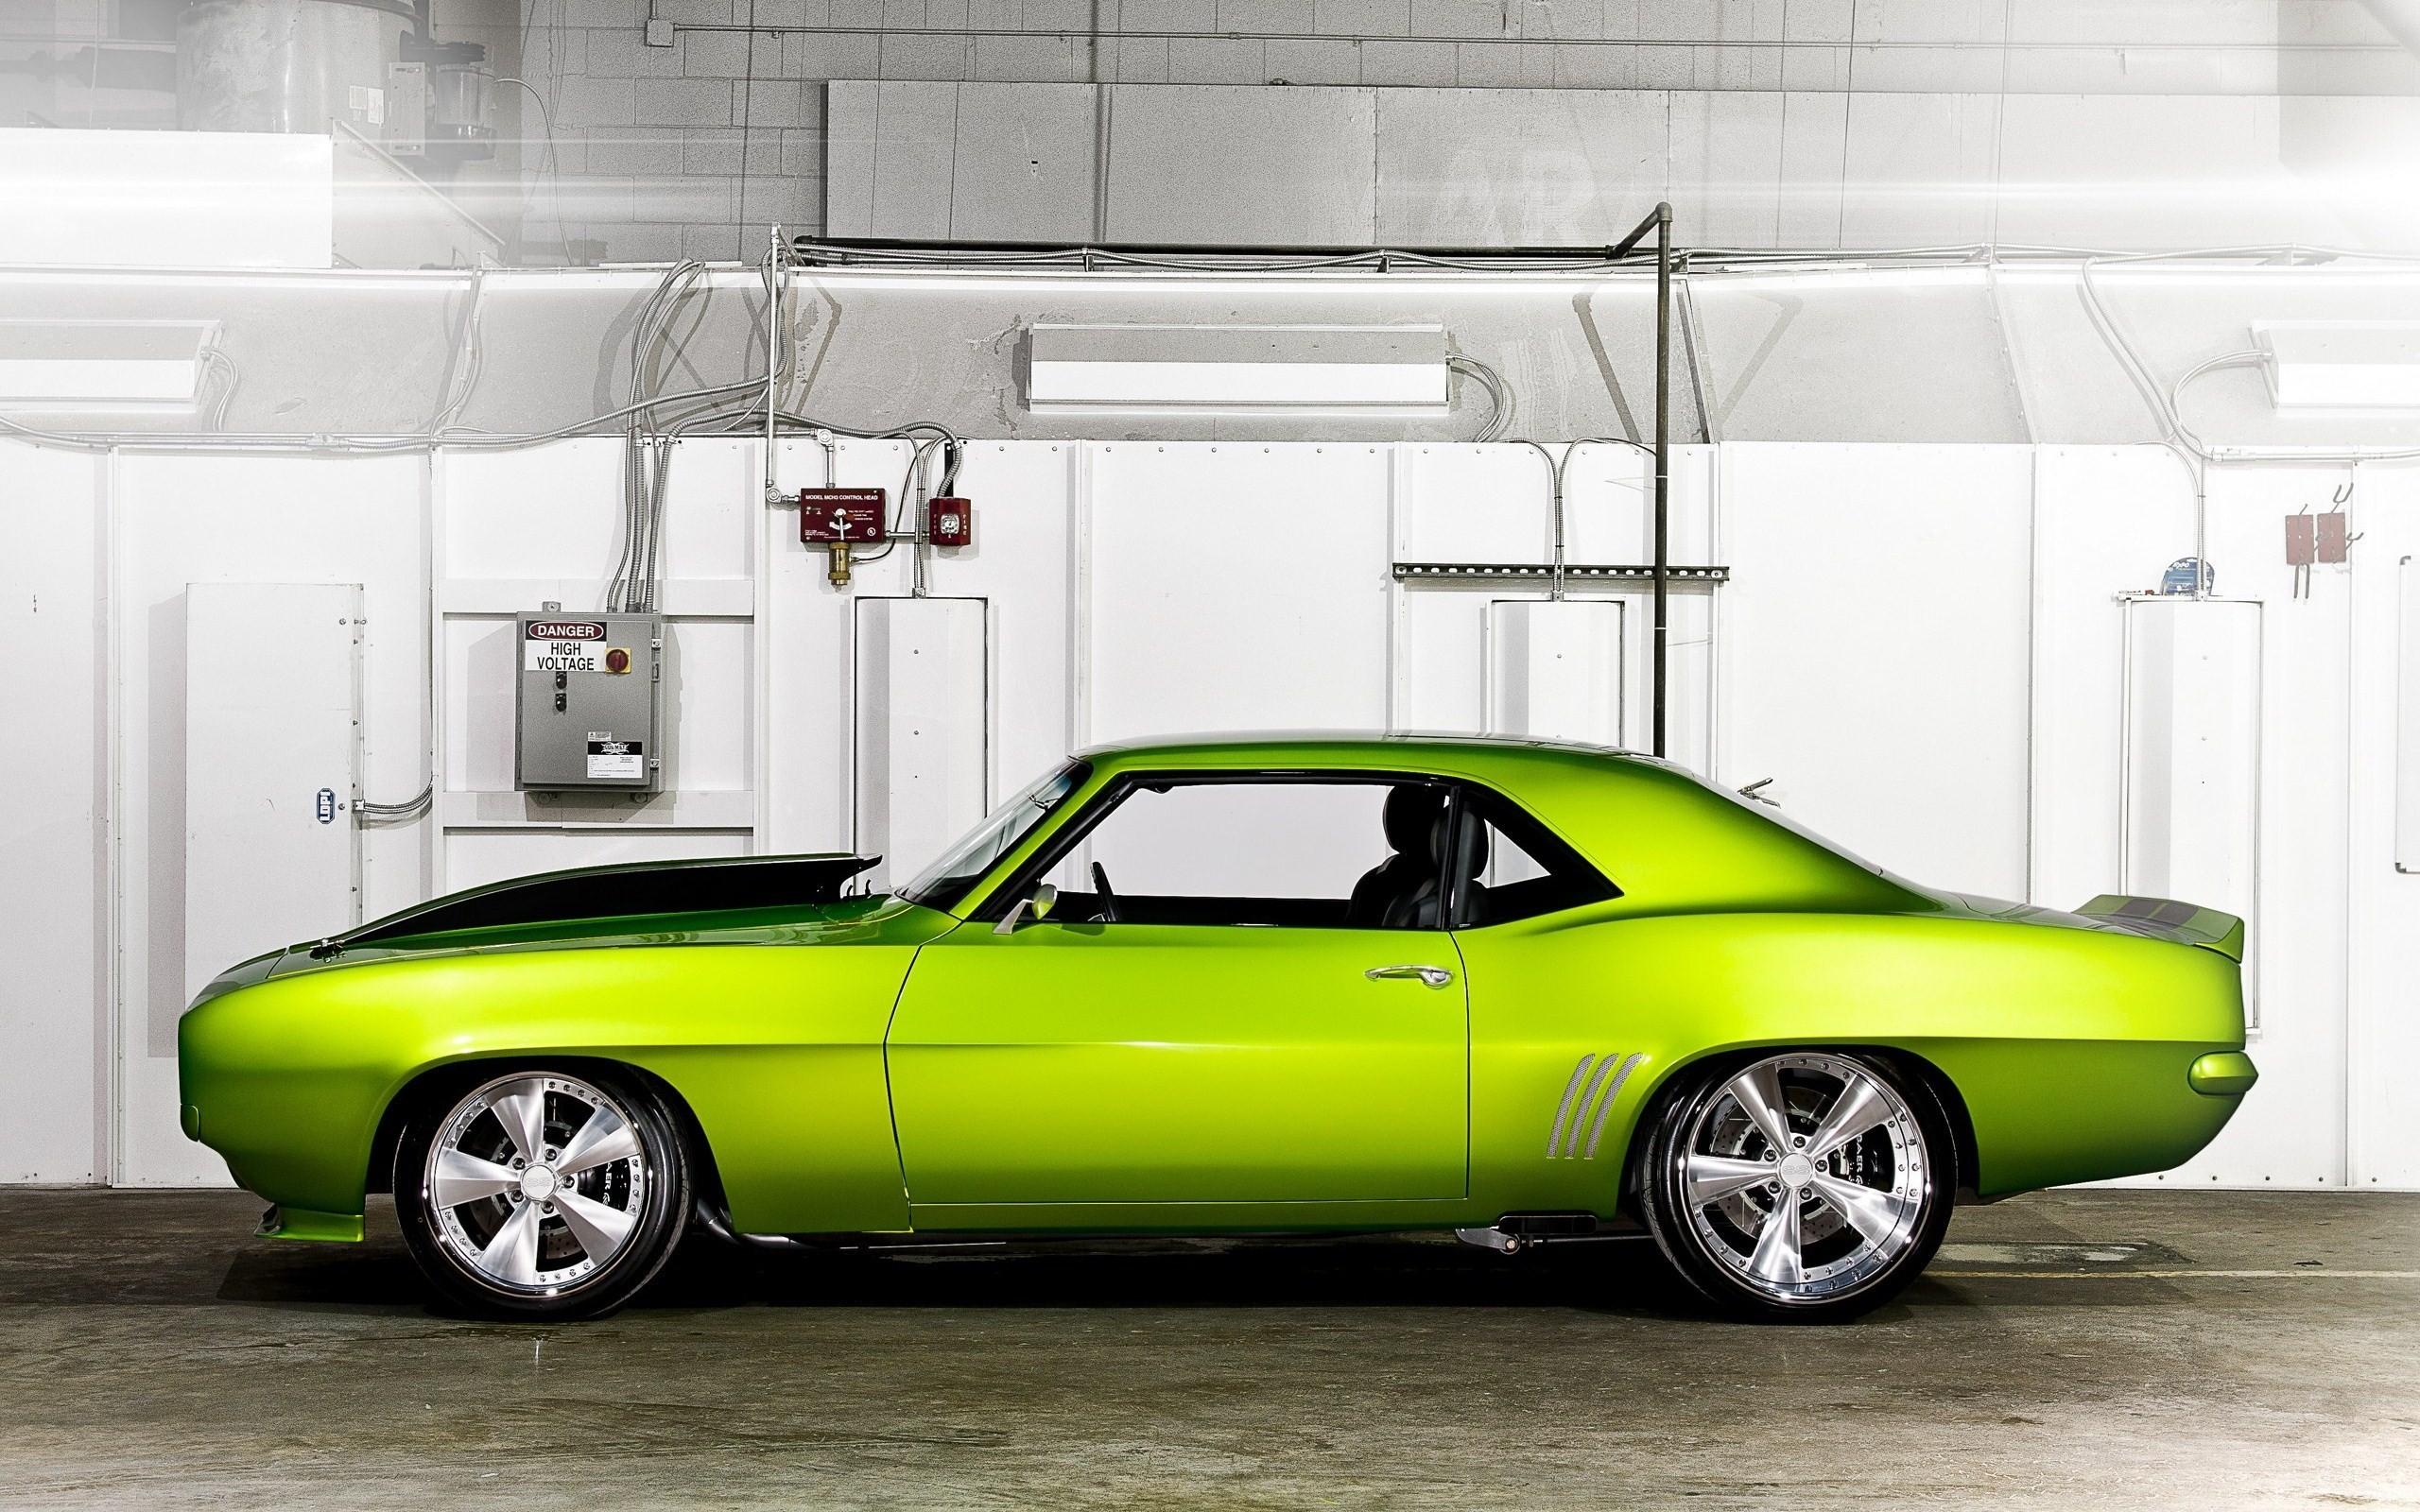 1969 Camaro Green Muscle Car Tuning Desktop Wallpaper Uploaded by  DesktopWalls